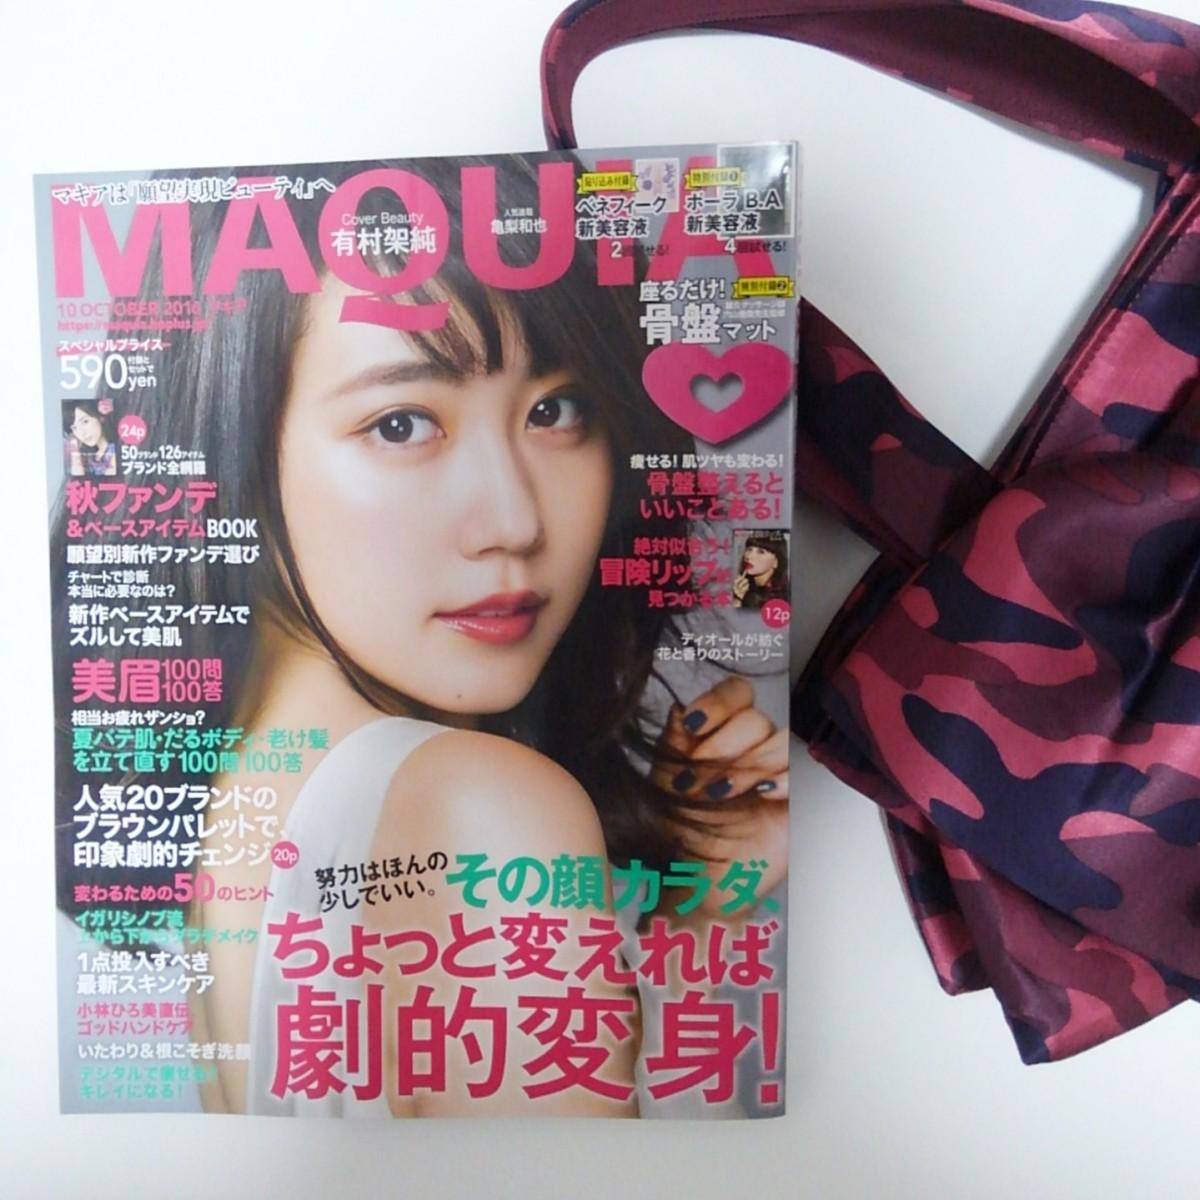 ◆《MAQUIA10月号発売》ちょっとの努力で劇的変身が叶う!この秋は今までと違う私に!◆